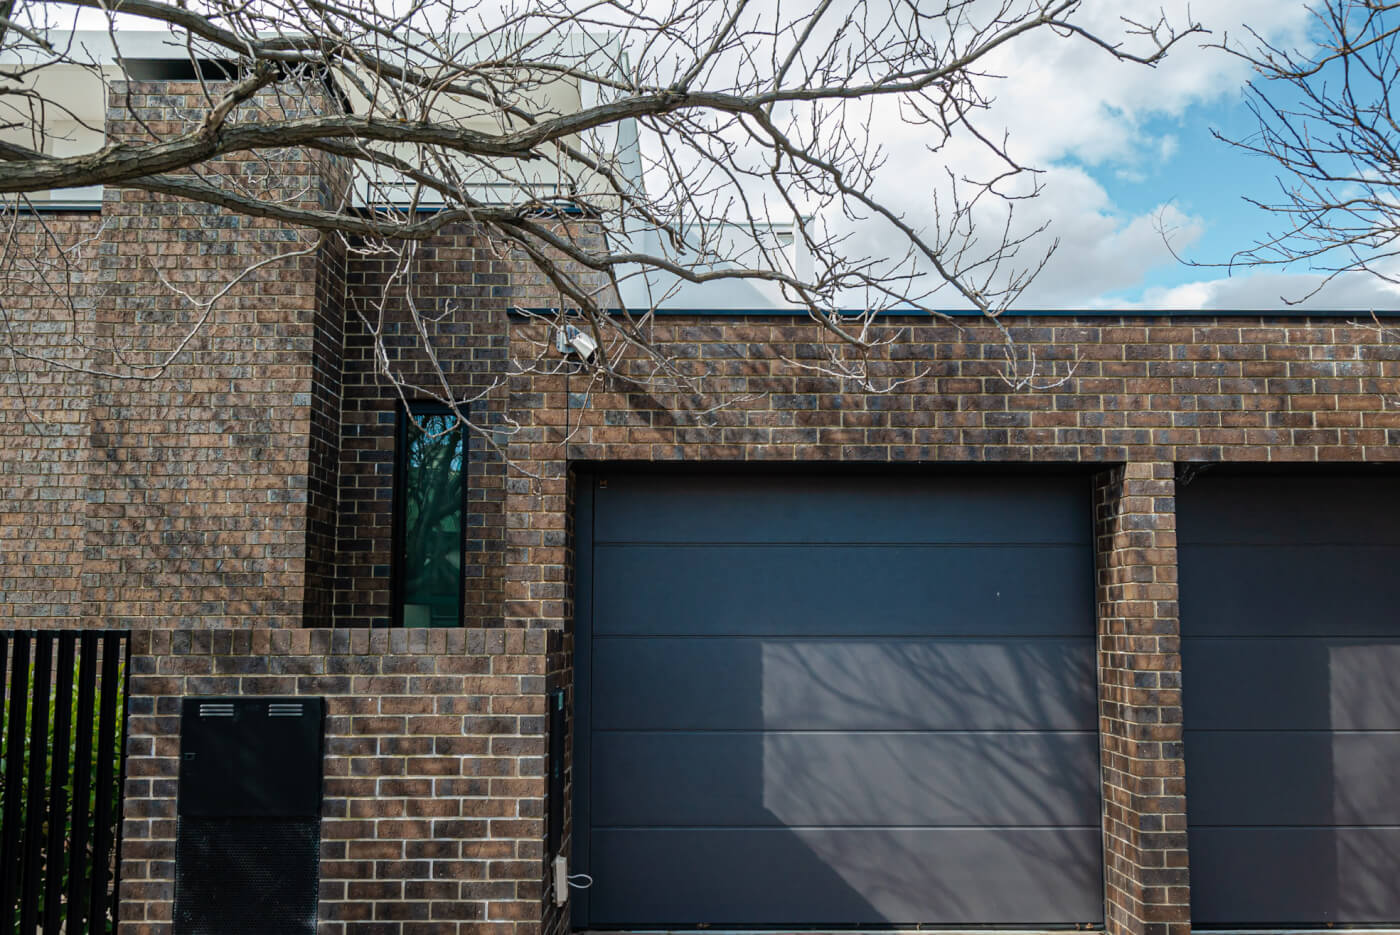 Coachhouse Brick 76mm Hyde Park Littlehampon Bricks And Pavers Reduced 19